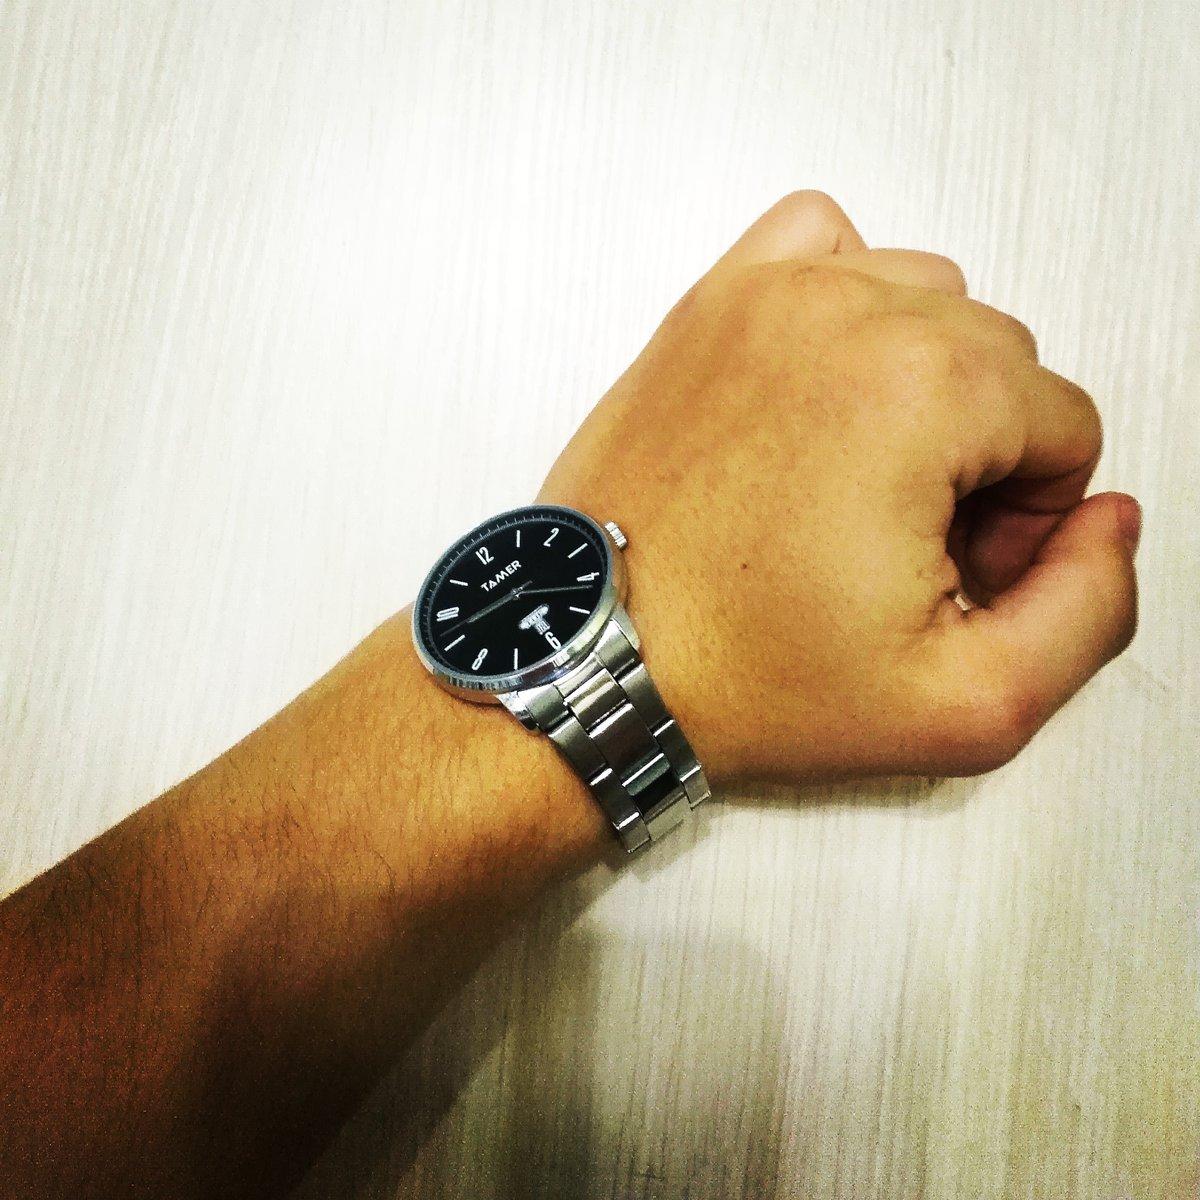 Не плохие часы